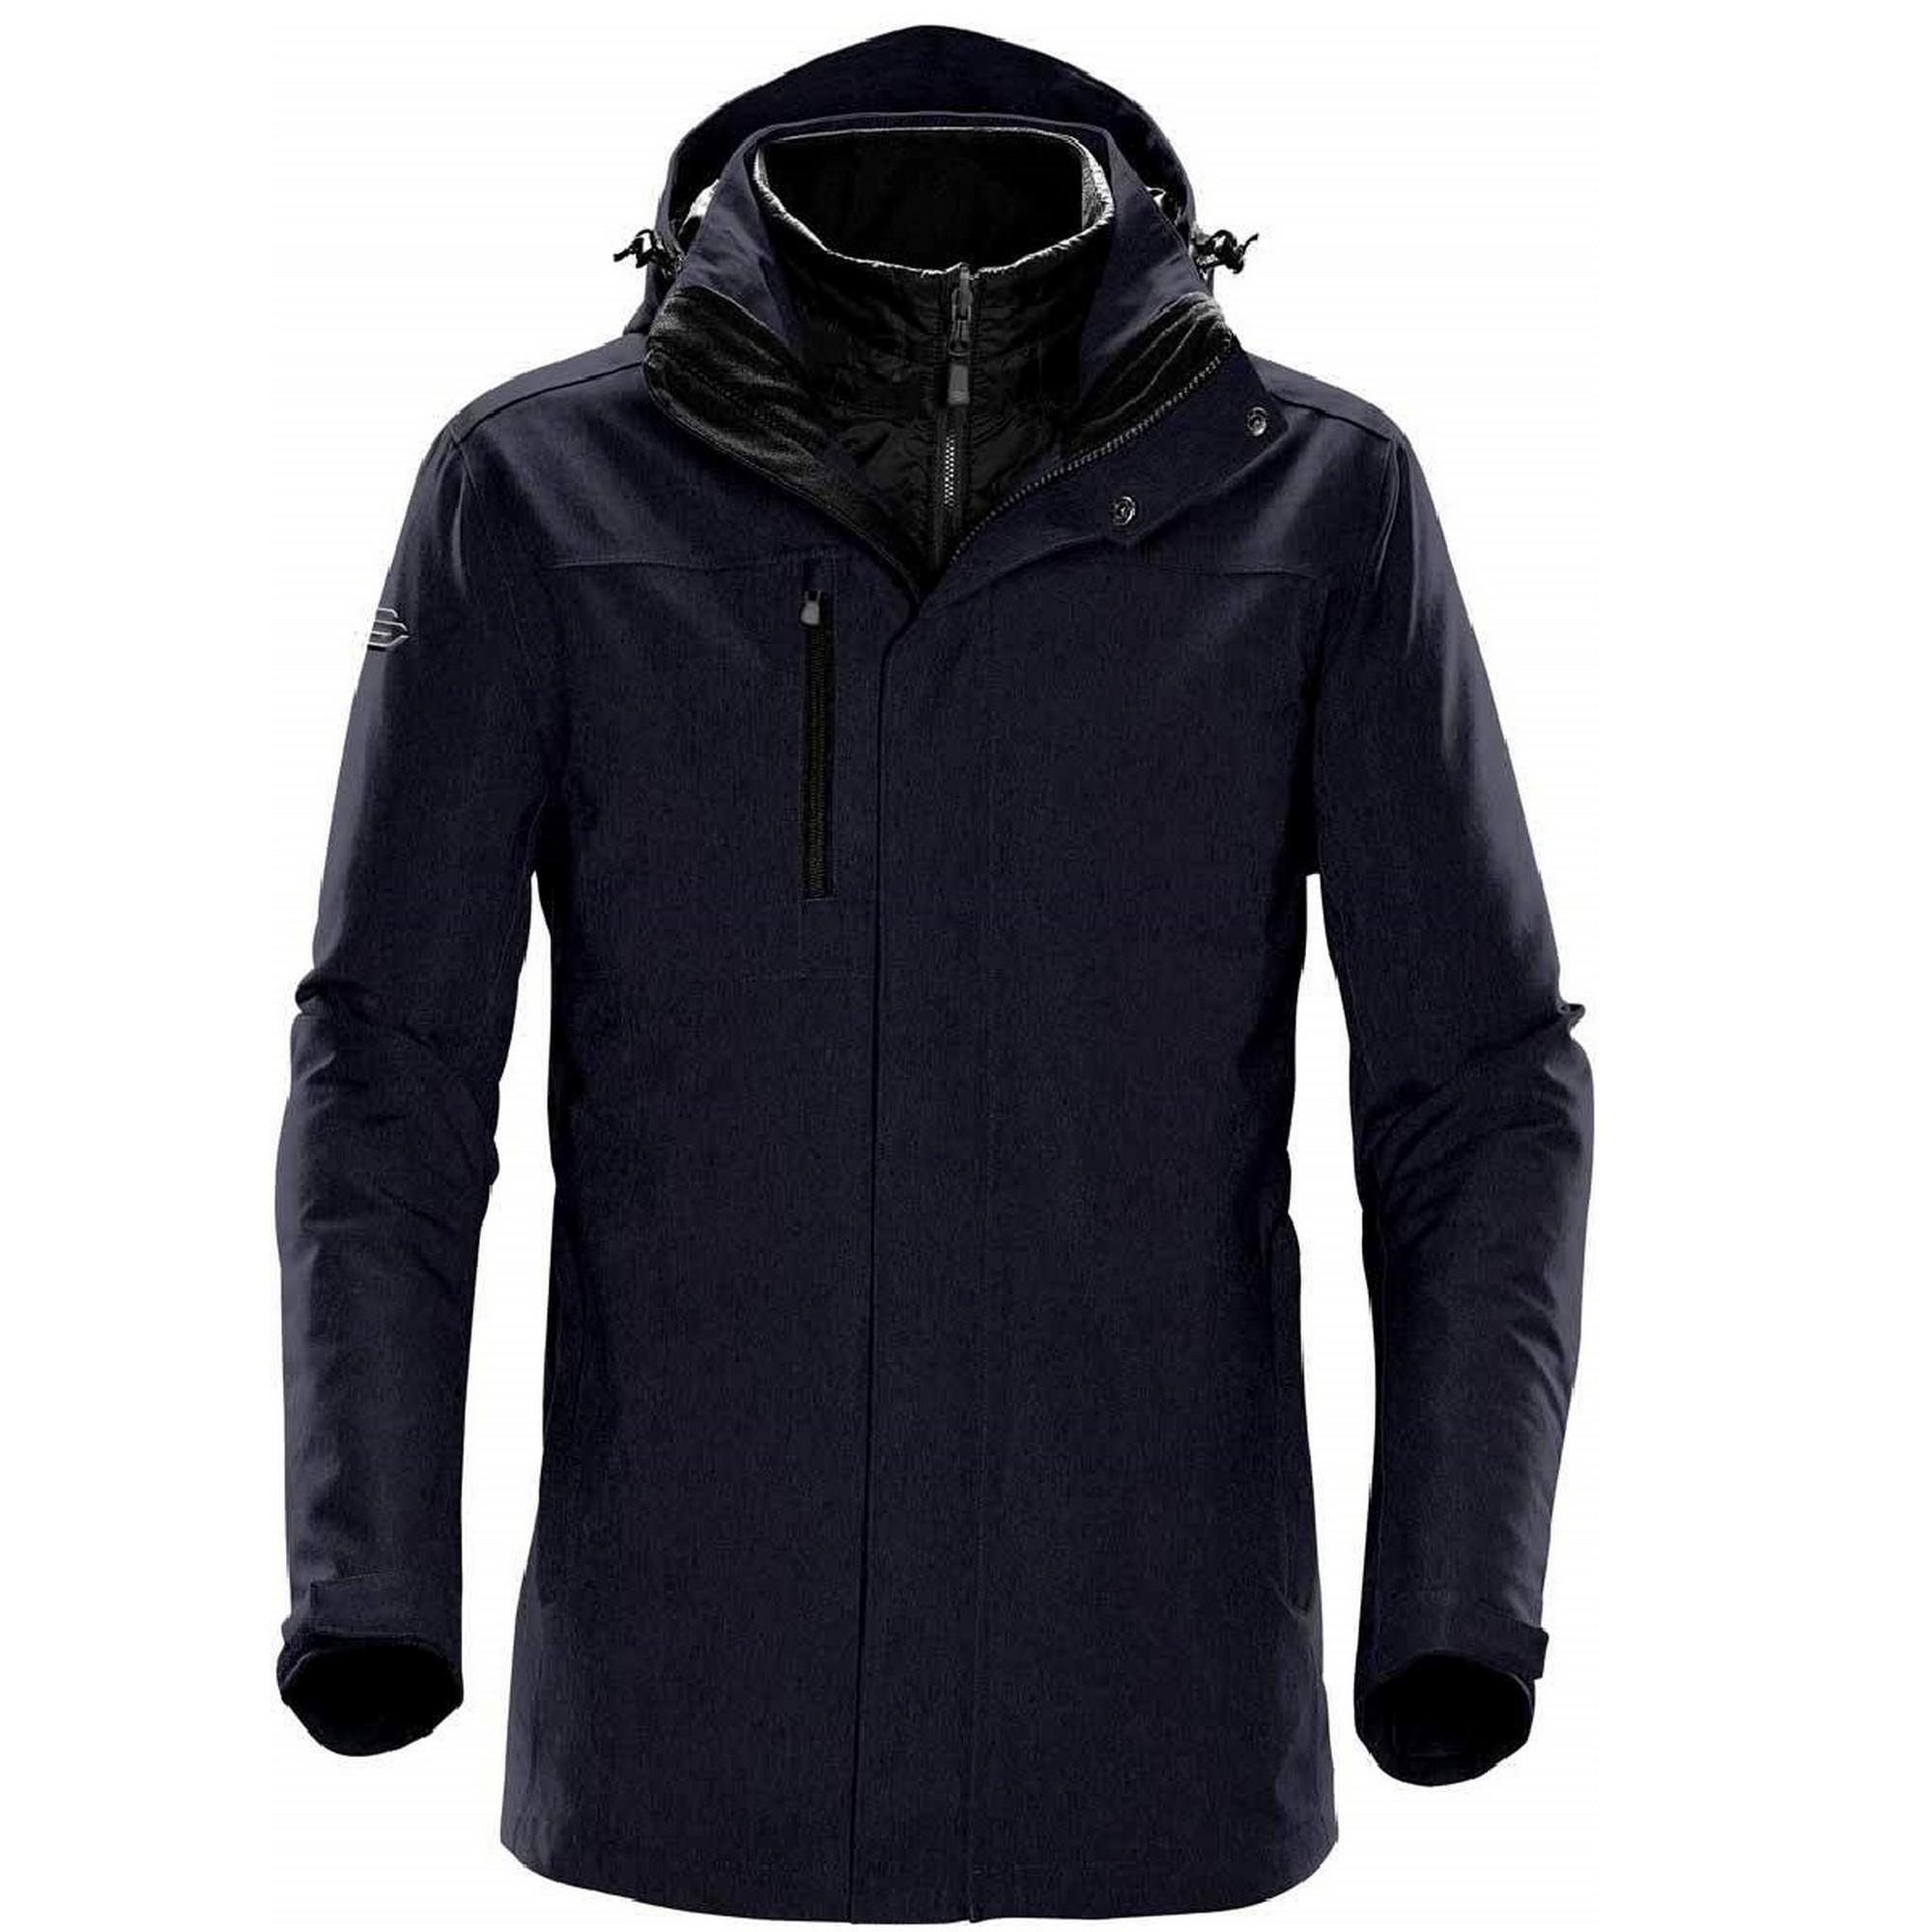 Stormtech Mens Avalanche System Jacket (2XL) (Navy Blue)